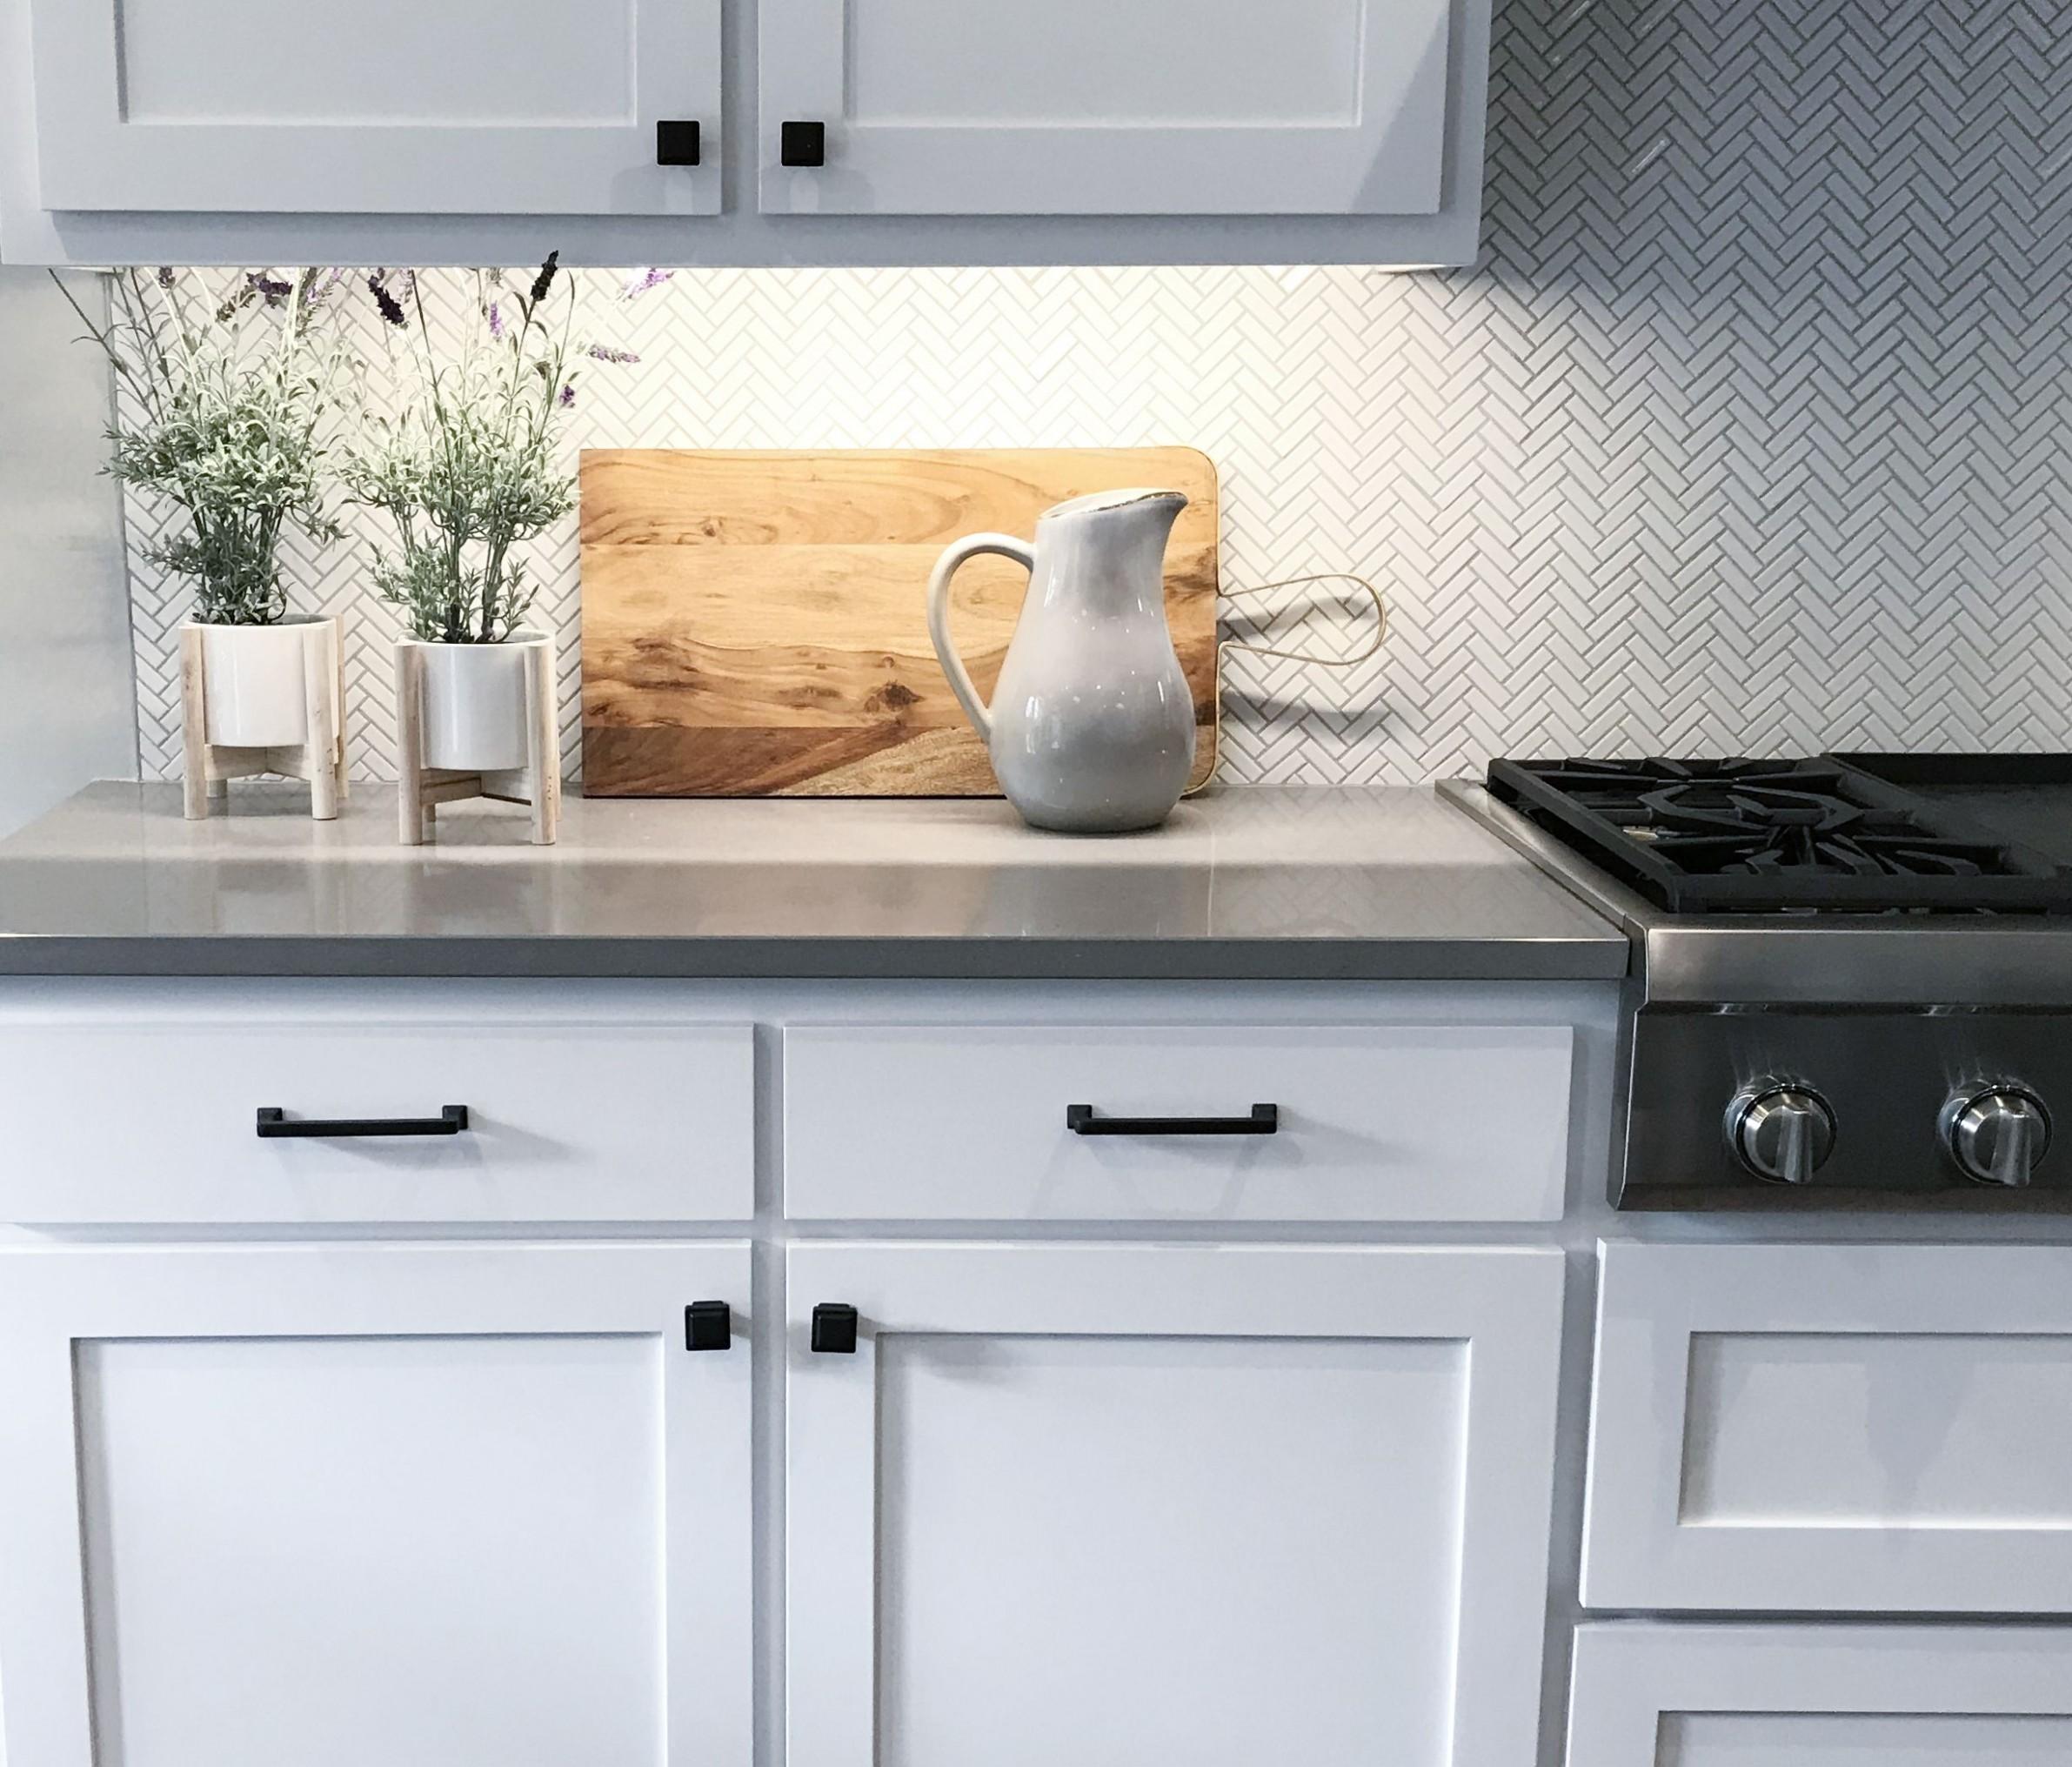 Installing New Cabinet Handles - Kitchen Cabinet Handle Design